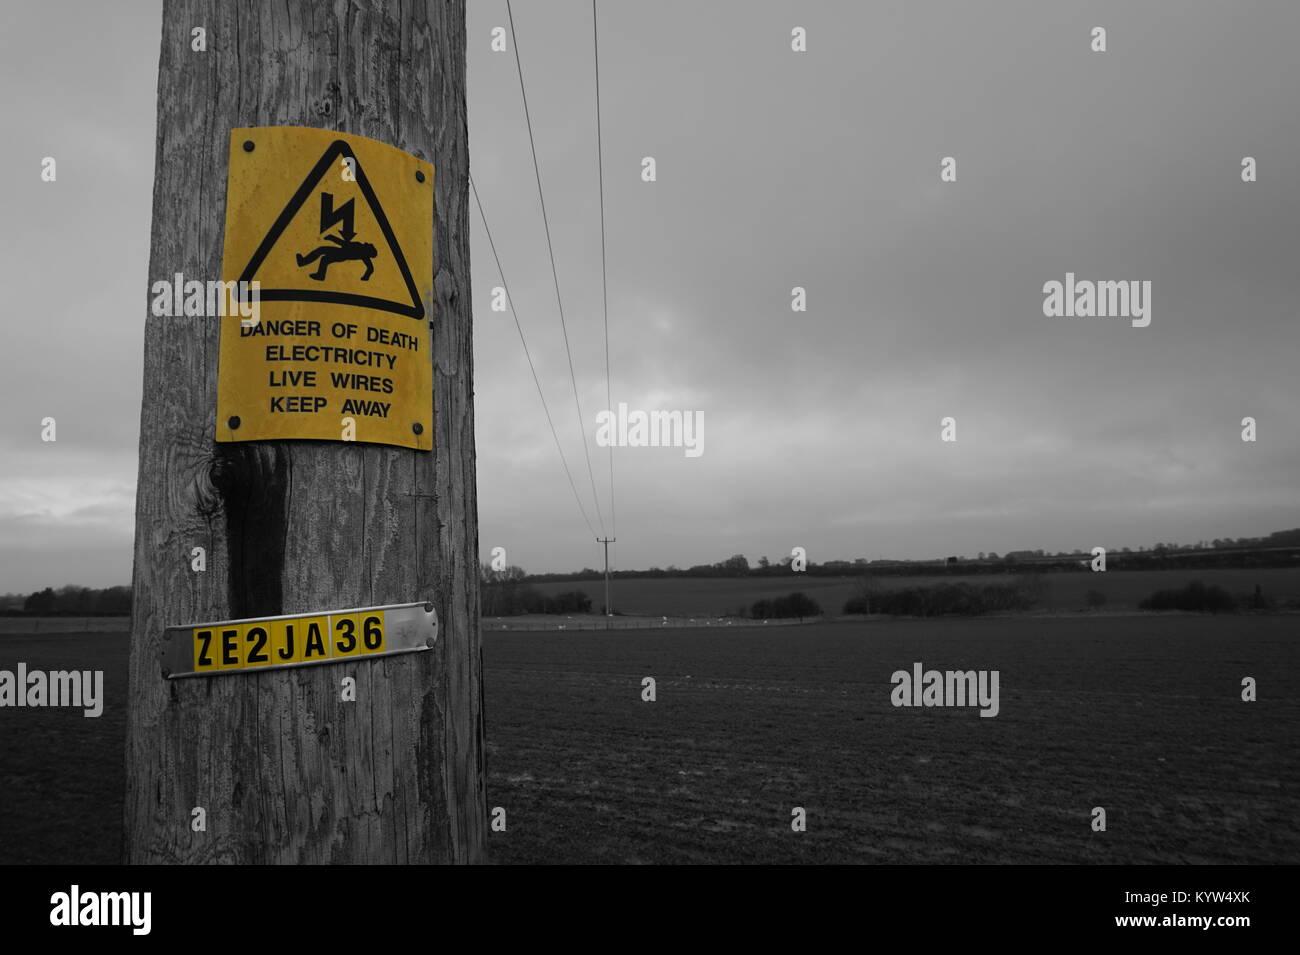 Yellow Danger Of Death Stockfotos & Yellow Danger Of Death Bilder ...